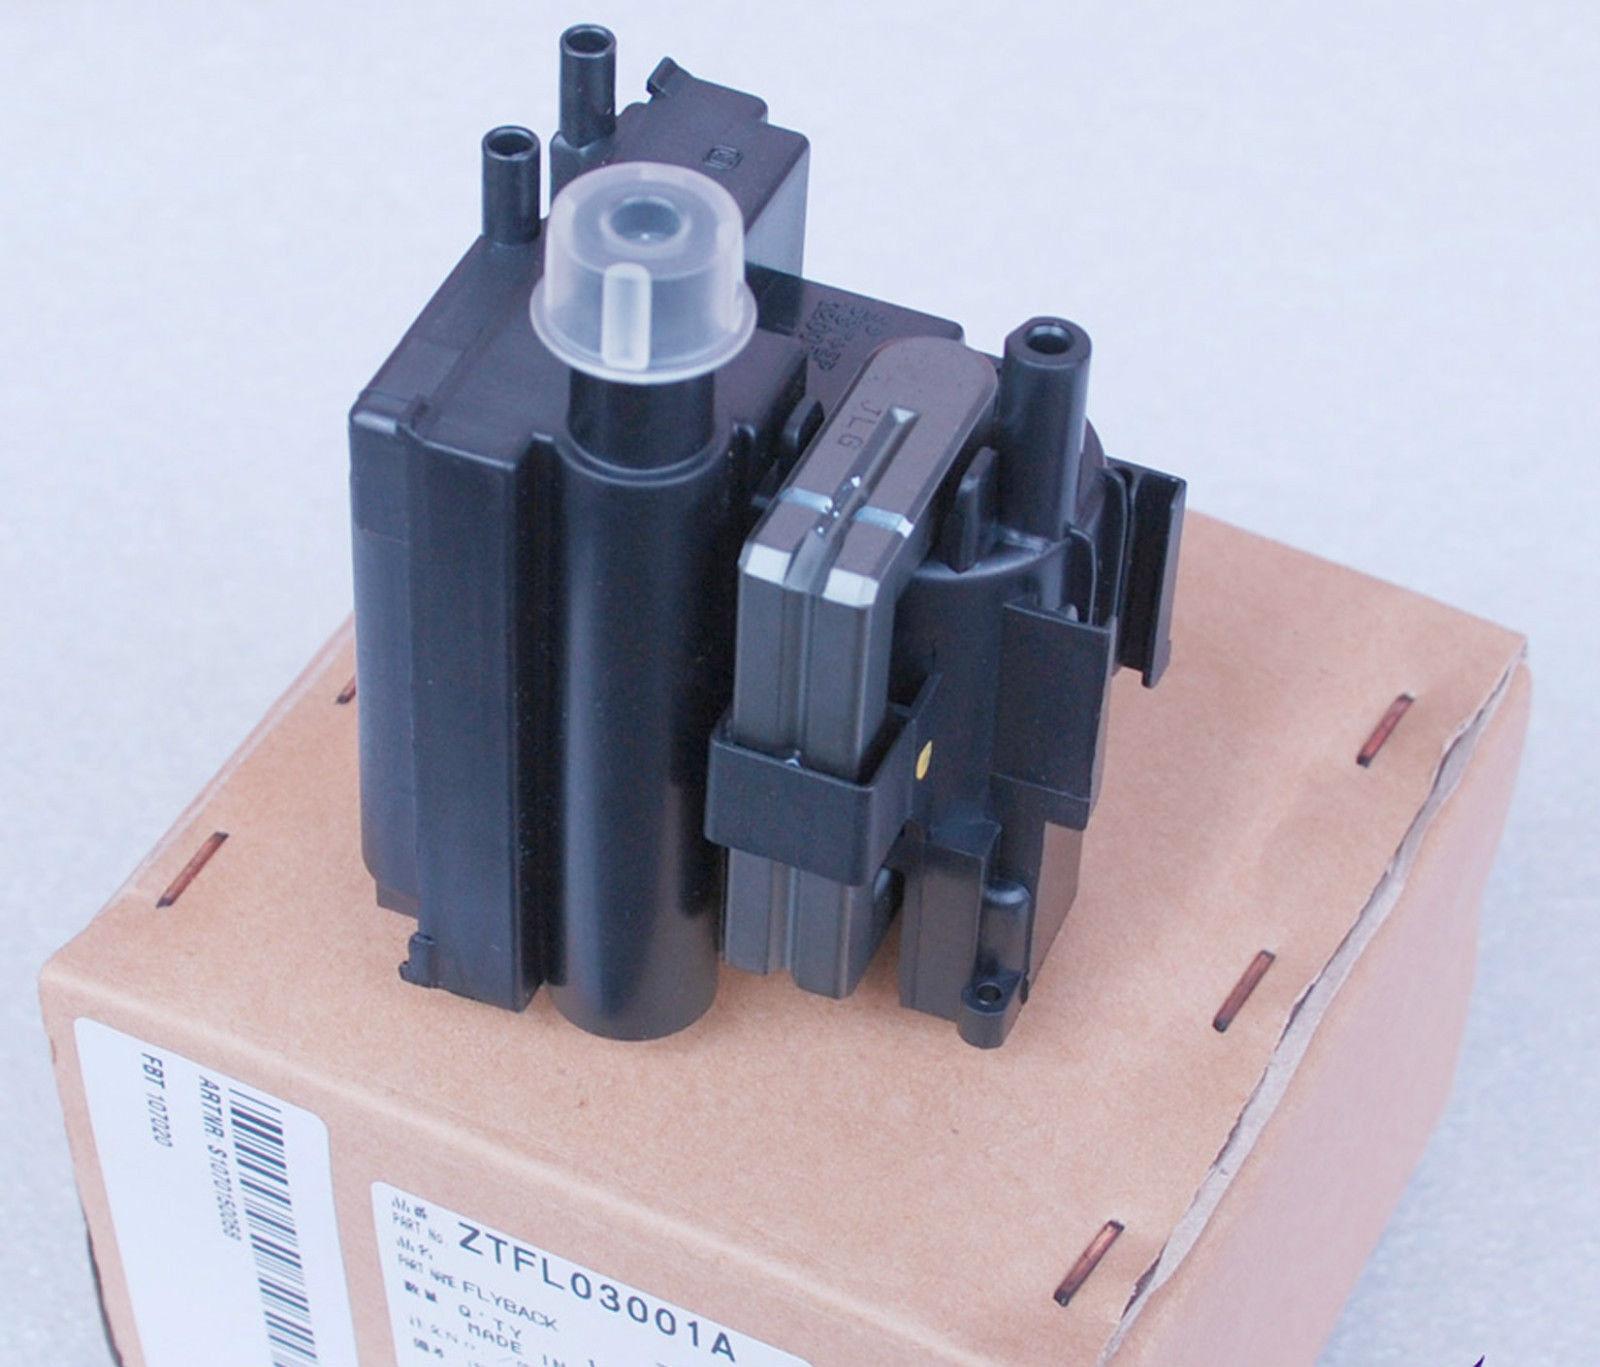 Transformer Flyback Transformer Panasonic ZTFL03001A For Display TV TR6 MM